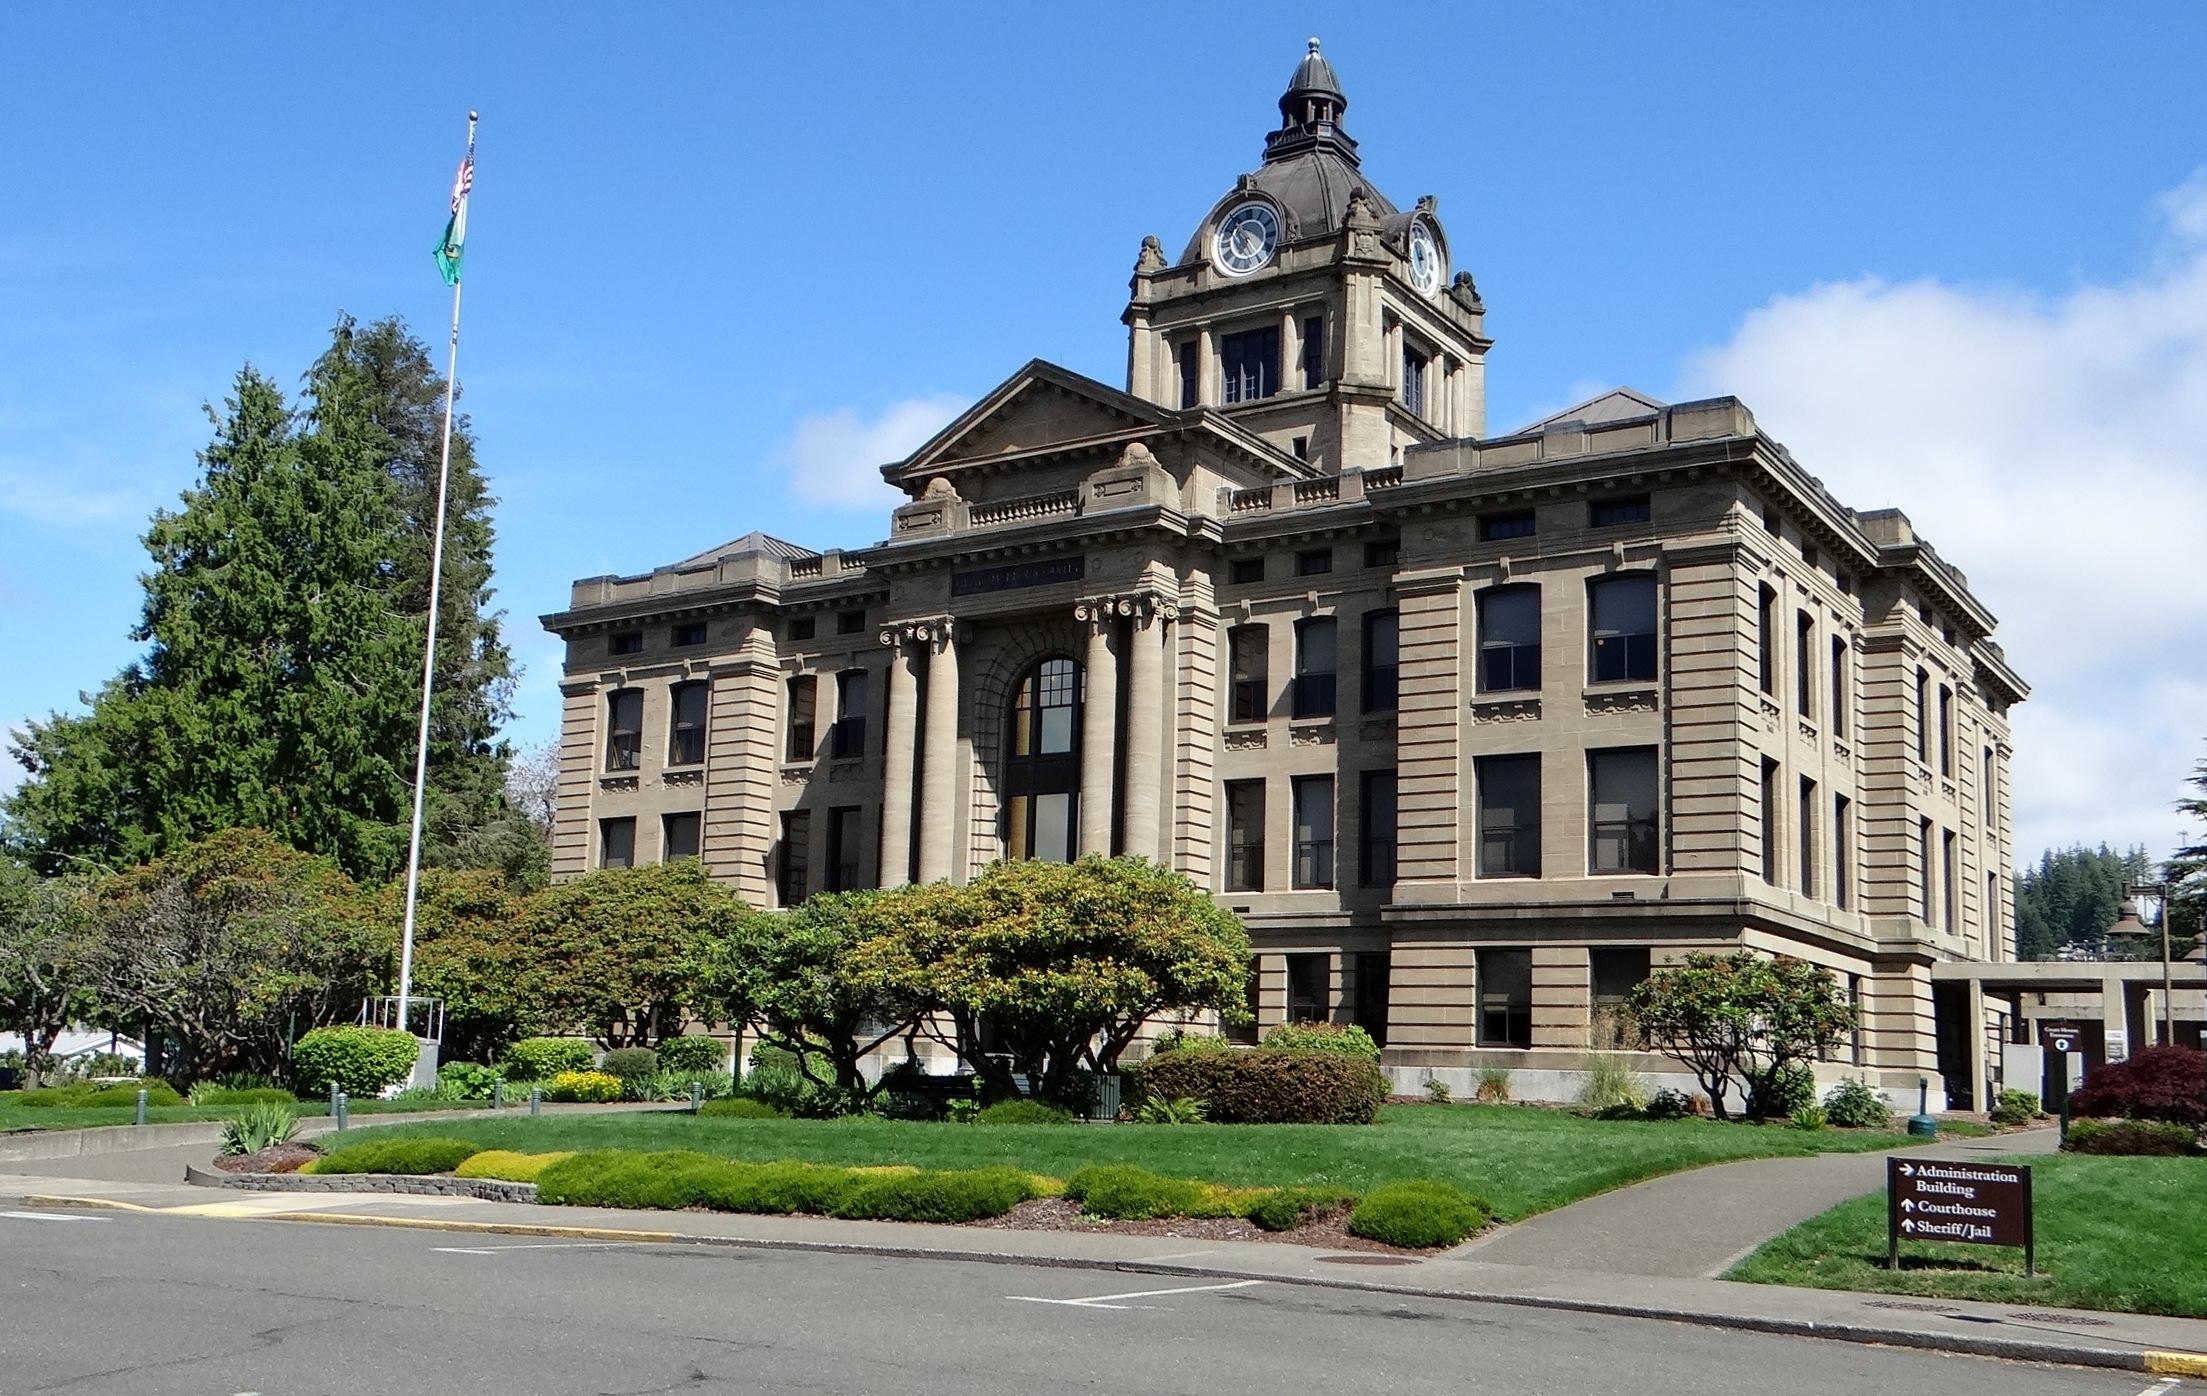 Grays Harbor County Court House – Montesano, Washington